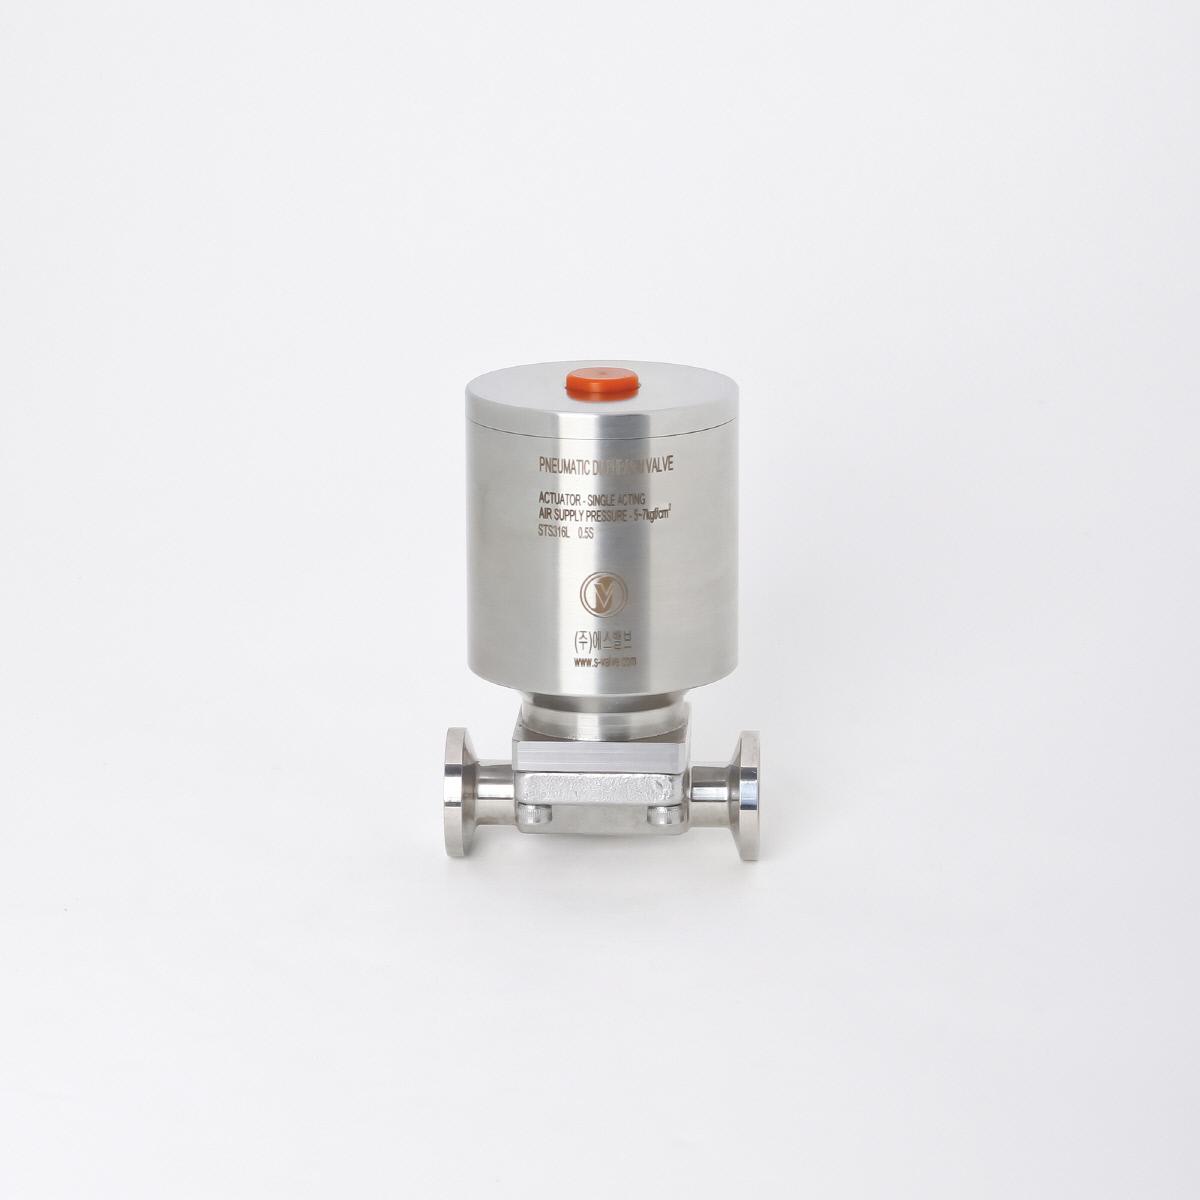 S-valve_0029.jpg